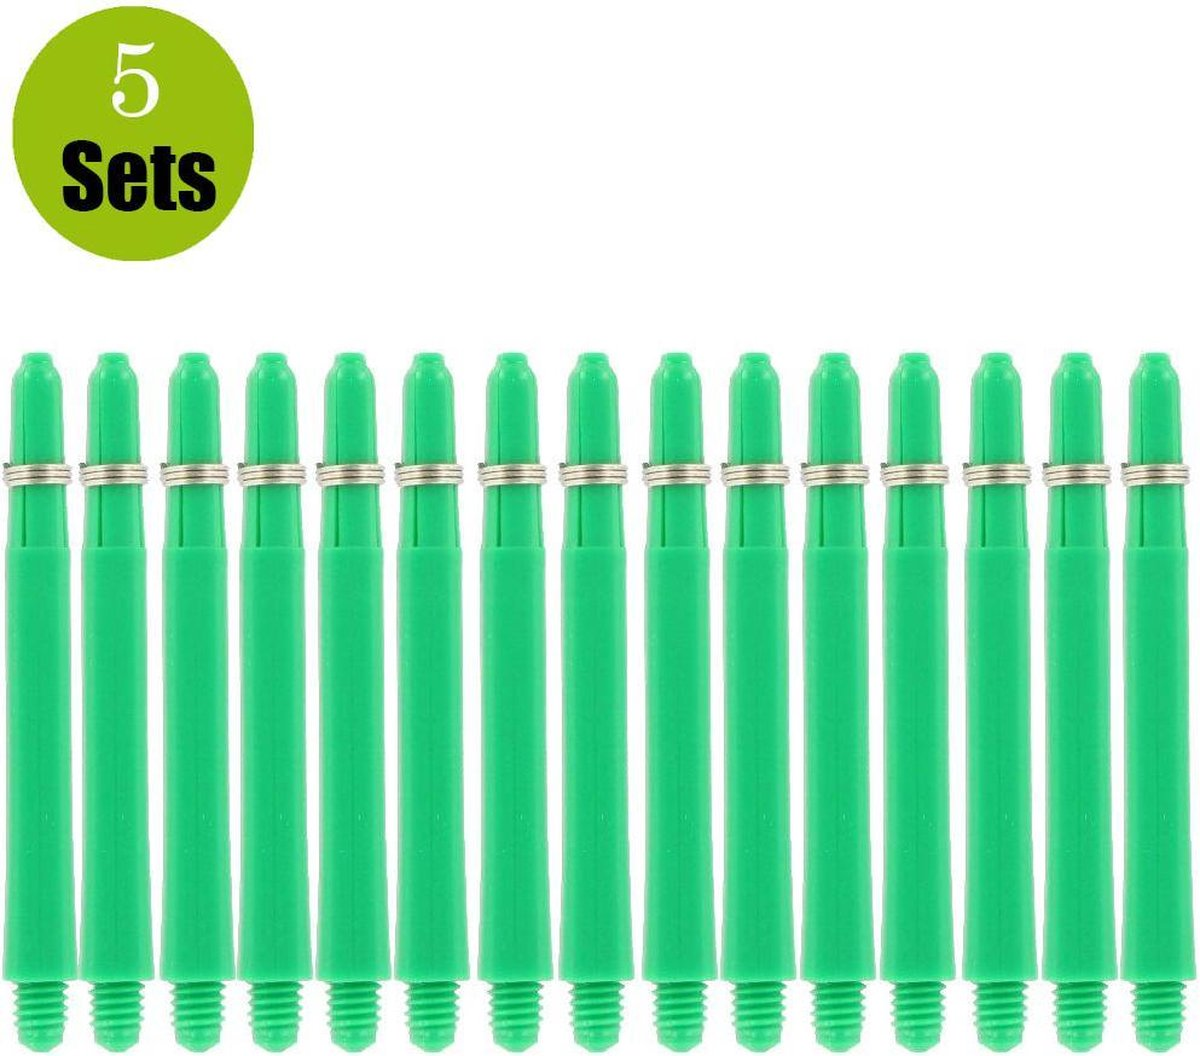 Bulls Nylon 5Sets DartShafts - Groen - Short - (5 Sets)